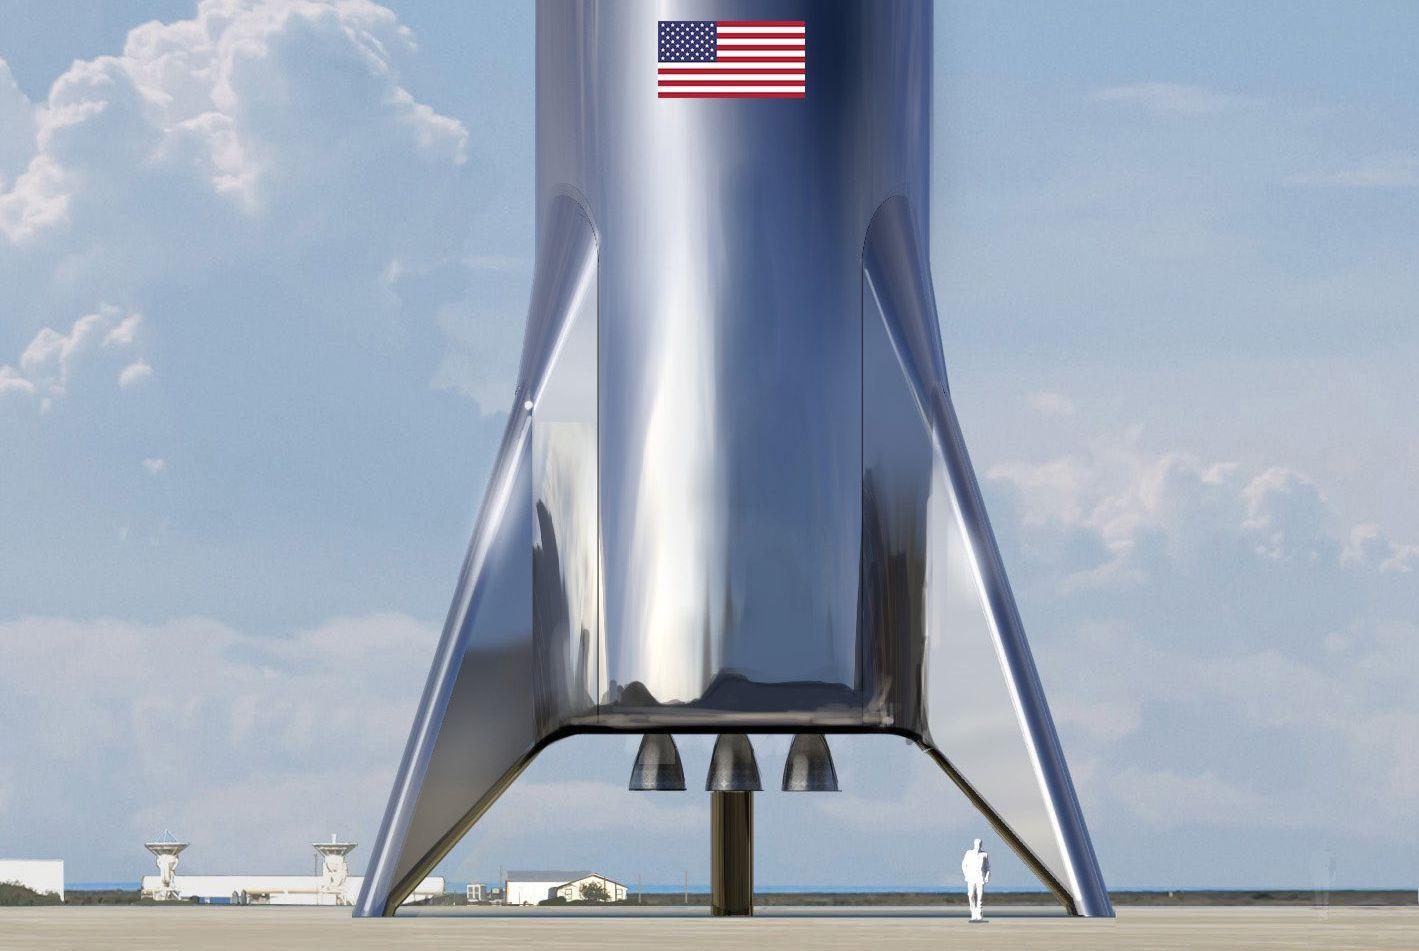 musk-starship2 (1).jpg